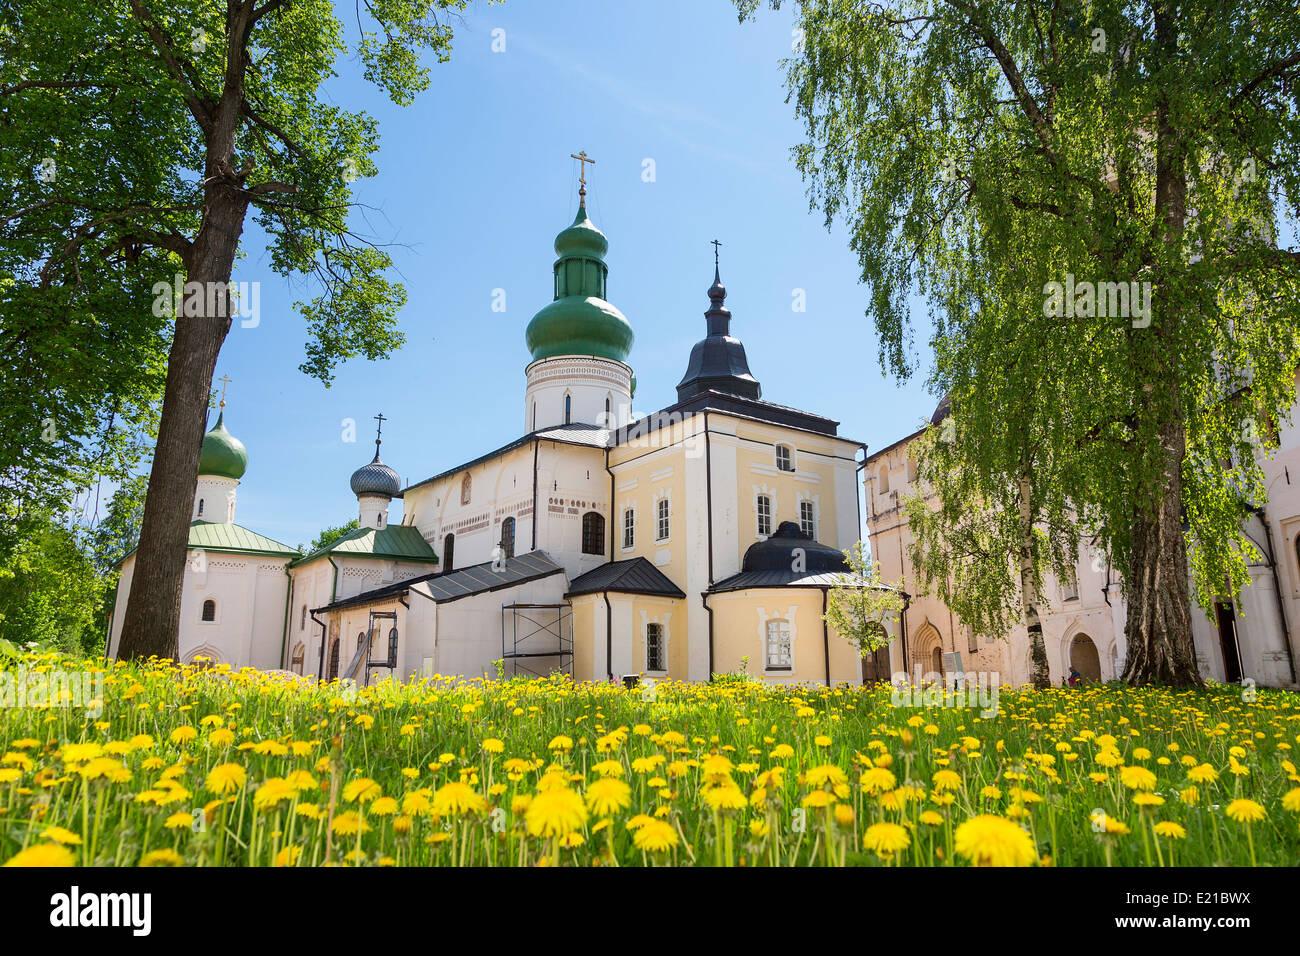 Russia Volga Kirillo-Belozersky Monastery - Stock Image